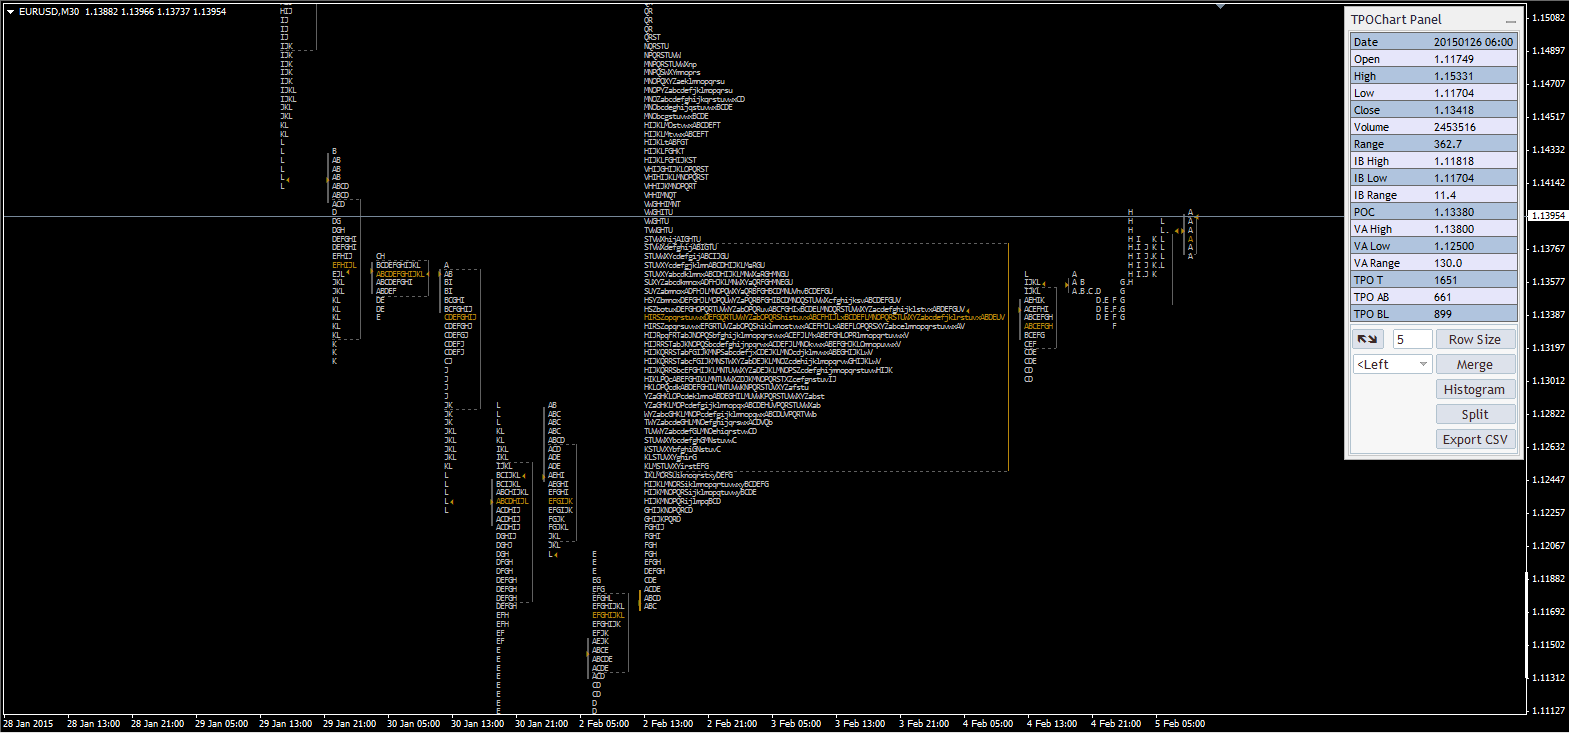 Market Profile Indicator - TPO Chart - Black Scheme